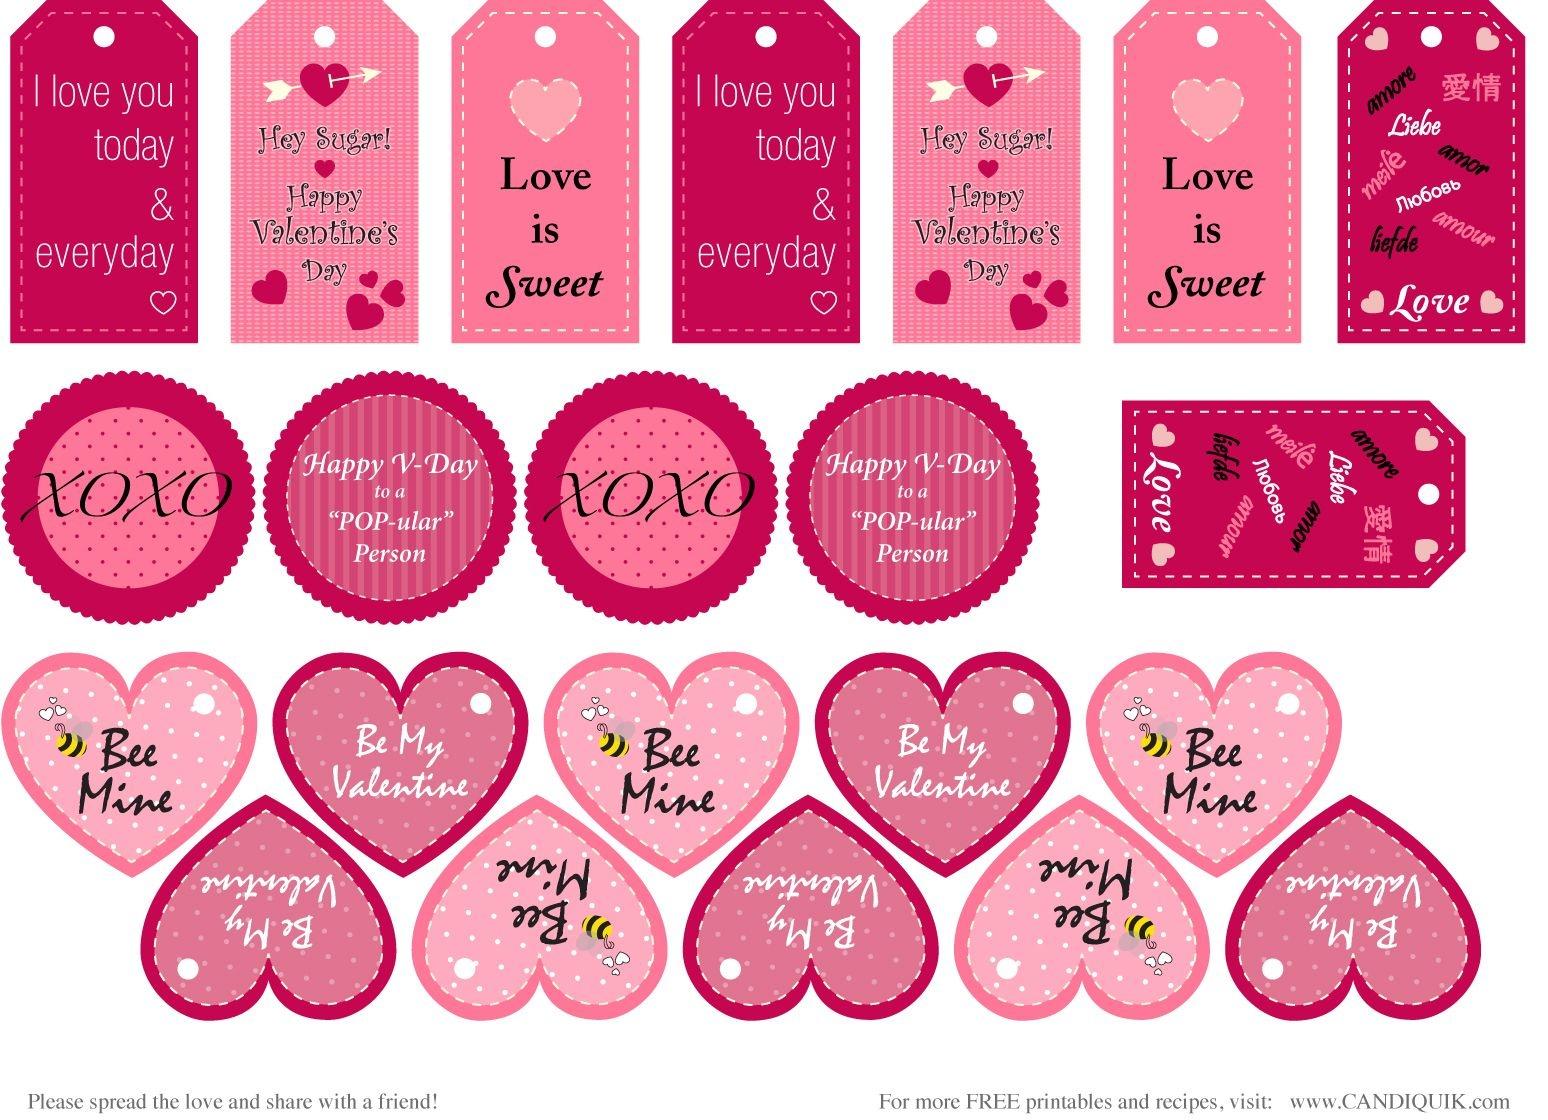 Free} Printables | Valentines | Valentine's Day Printables - Free Printable Valentine Graphics